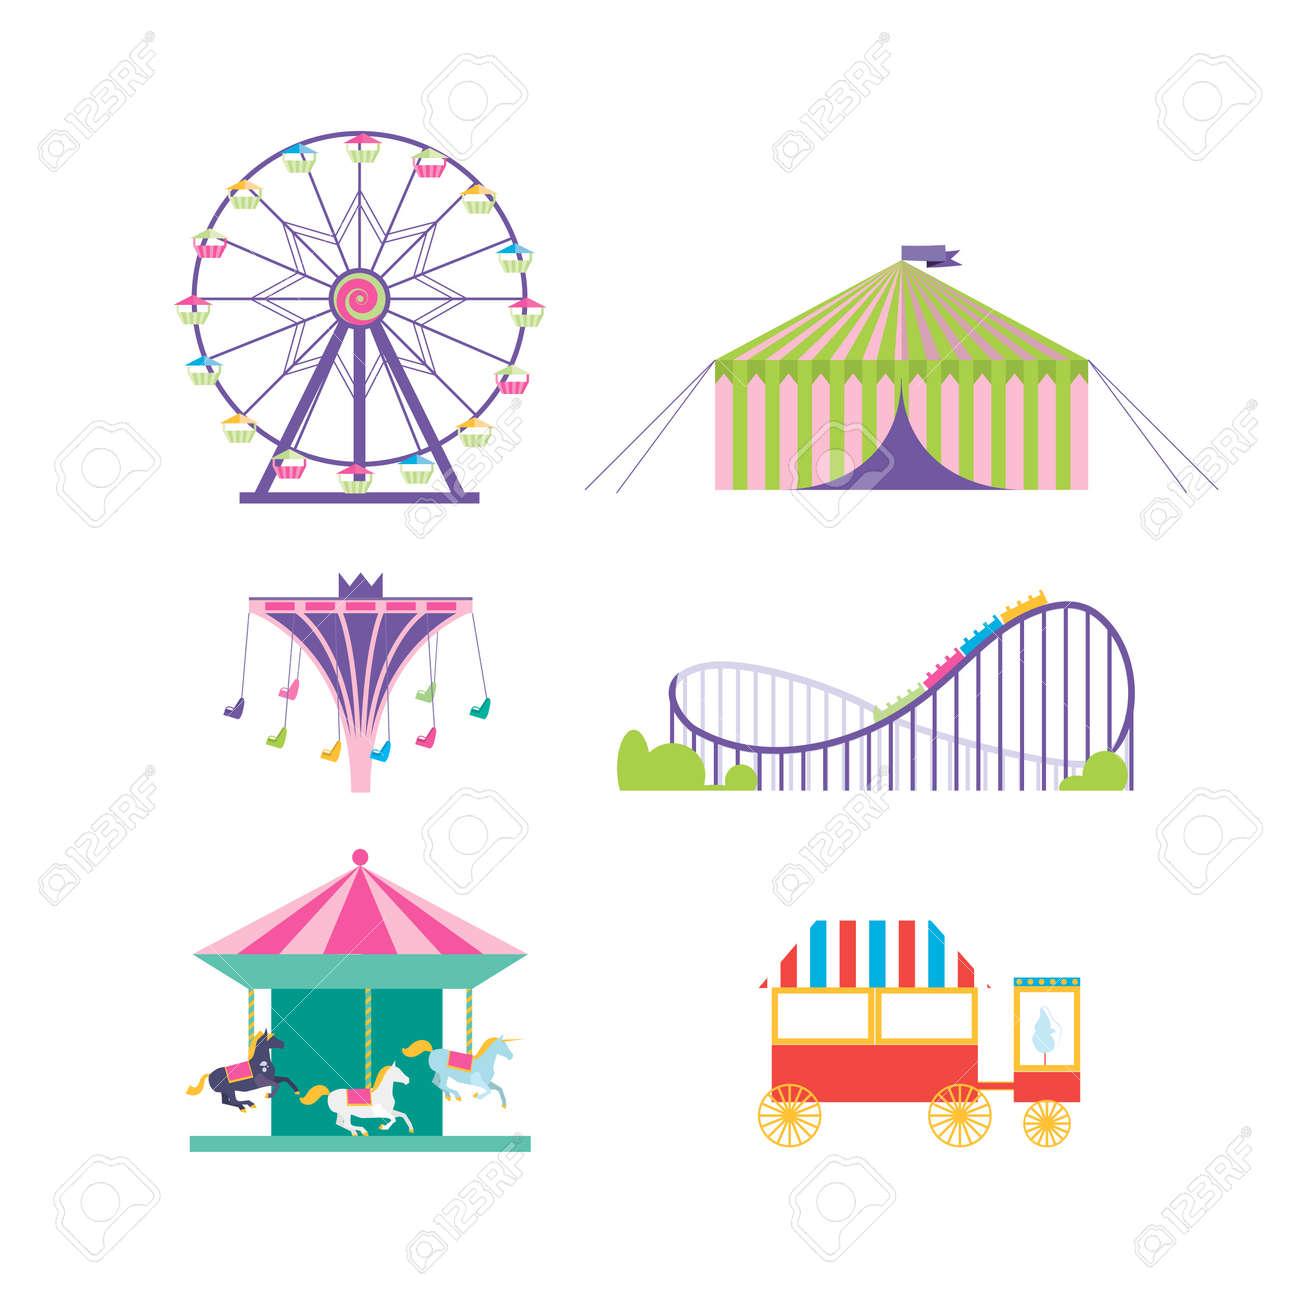 Amusement park vector set. Ferris wheel, roller coaster, popcorn, carousel, carousel with horses - 51380588